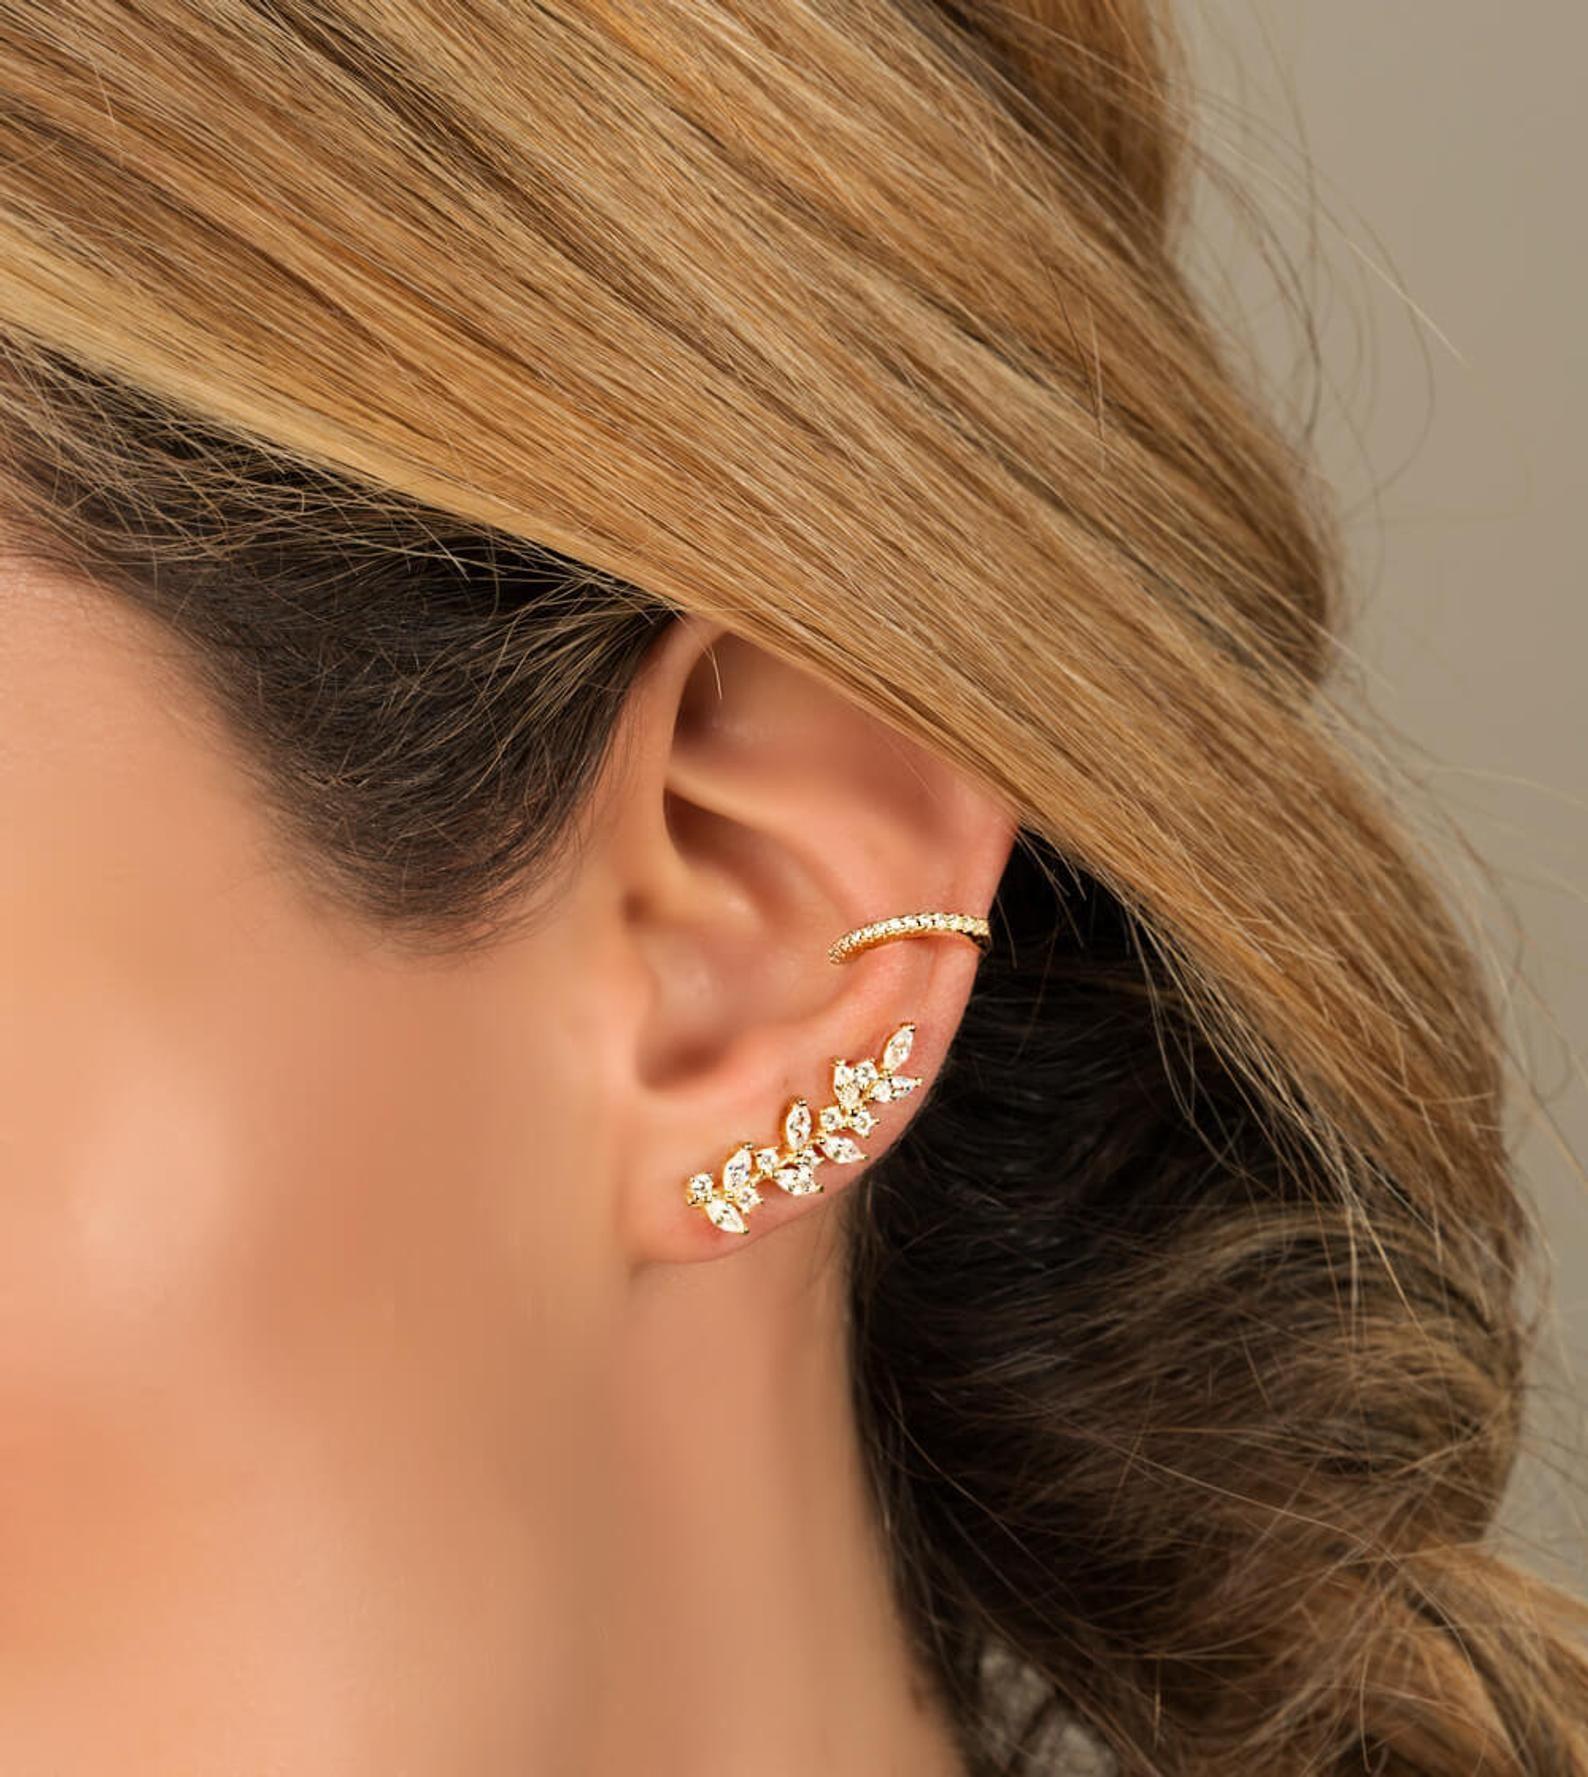 Ear Climber Gold Ear Climbers Ear Crawler Ear Climber Etsy Emerald Earrings Studs Silver Crystal Earrings Tiny Stud Earrings